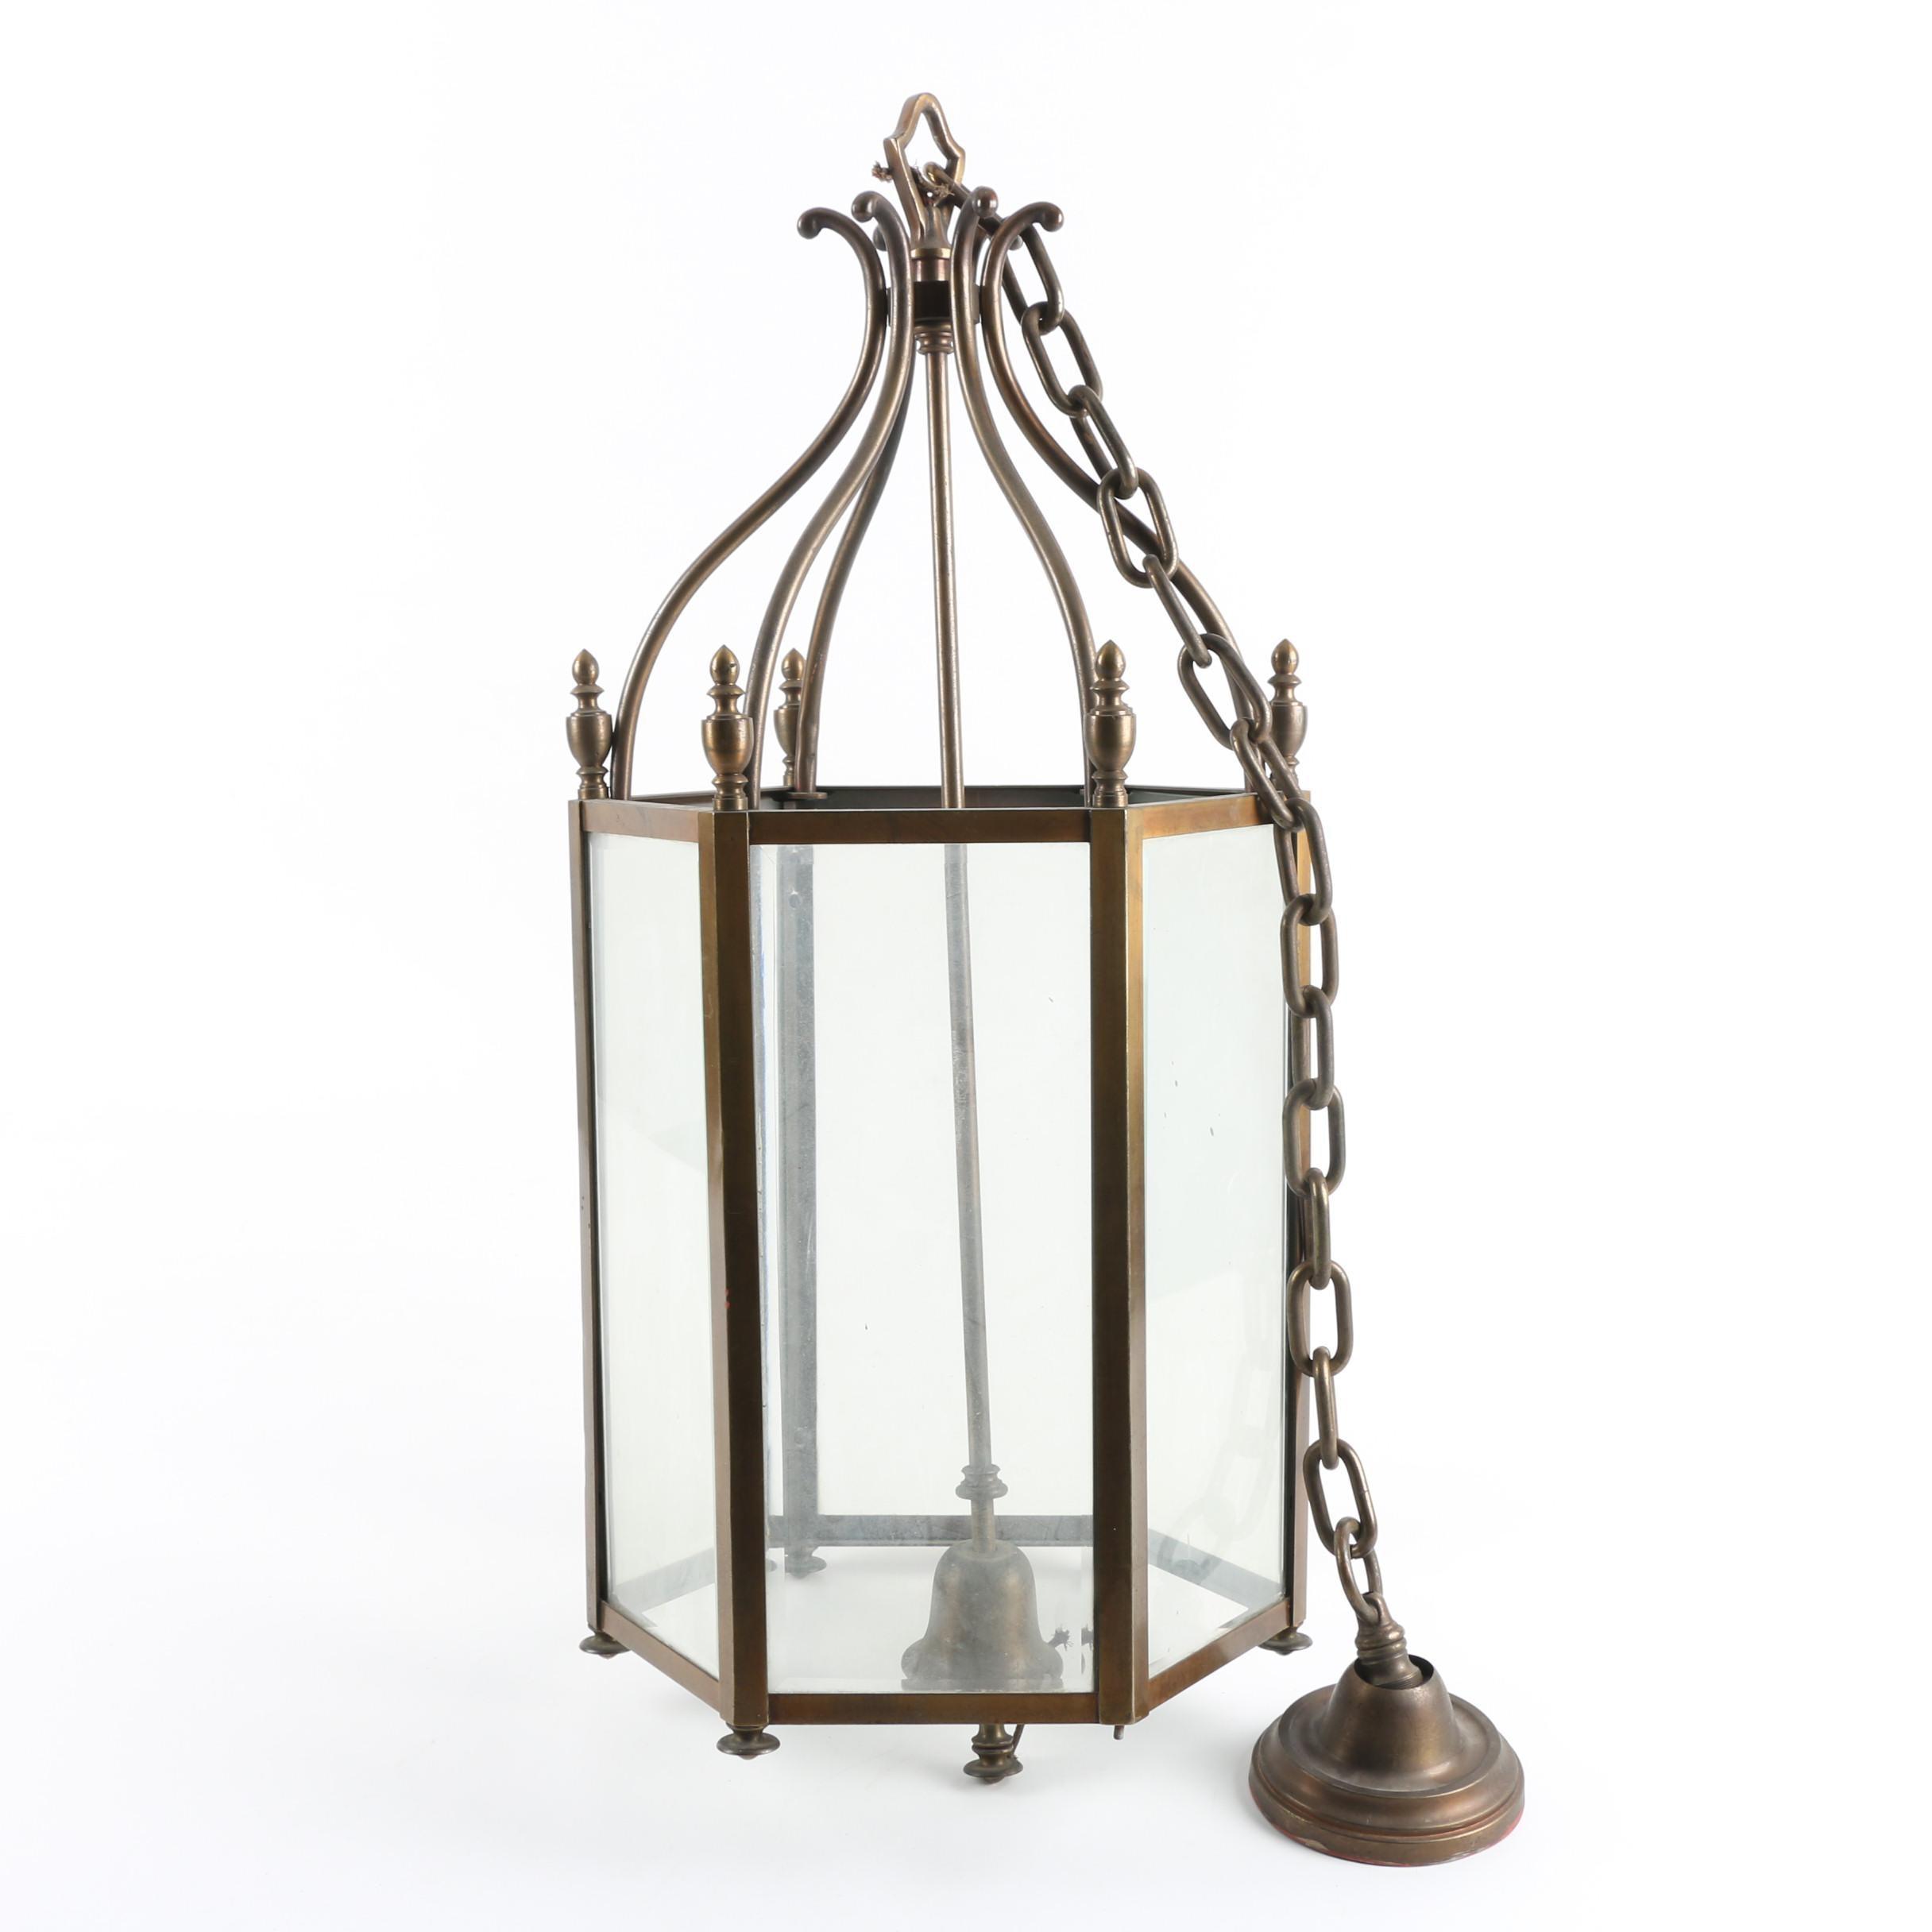 Large Brass Hanging Lantern Frame and Parts